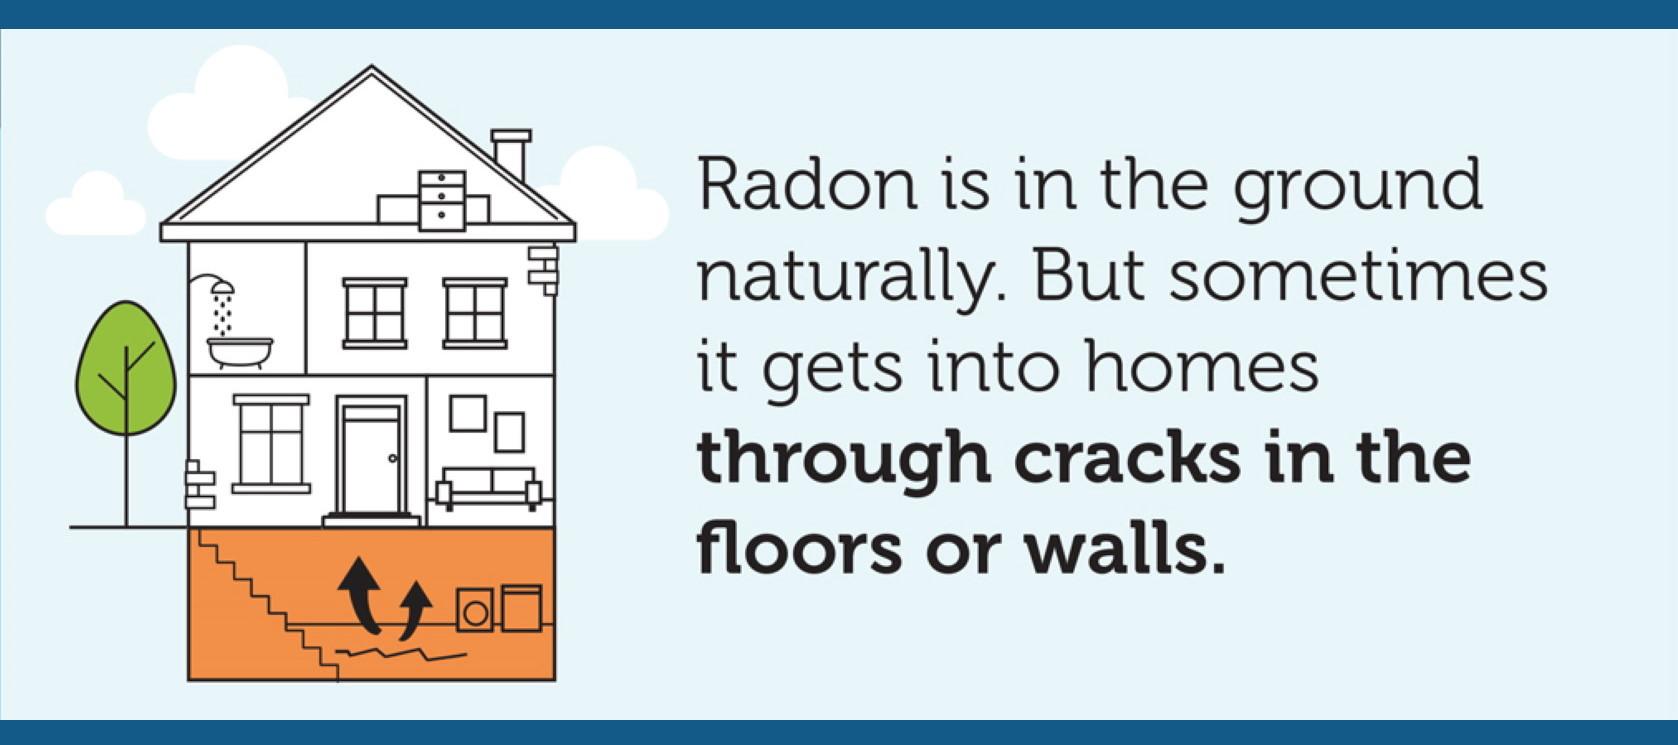 Radon definition image